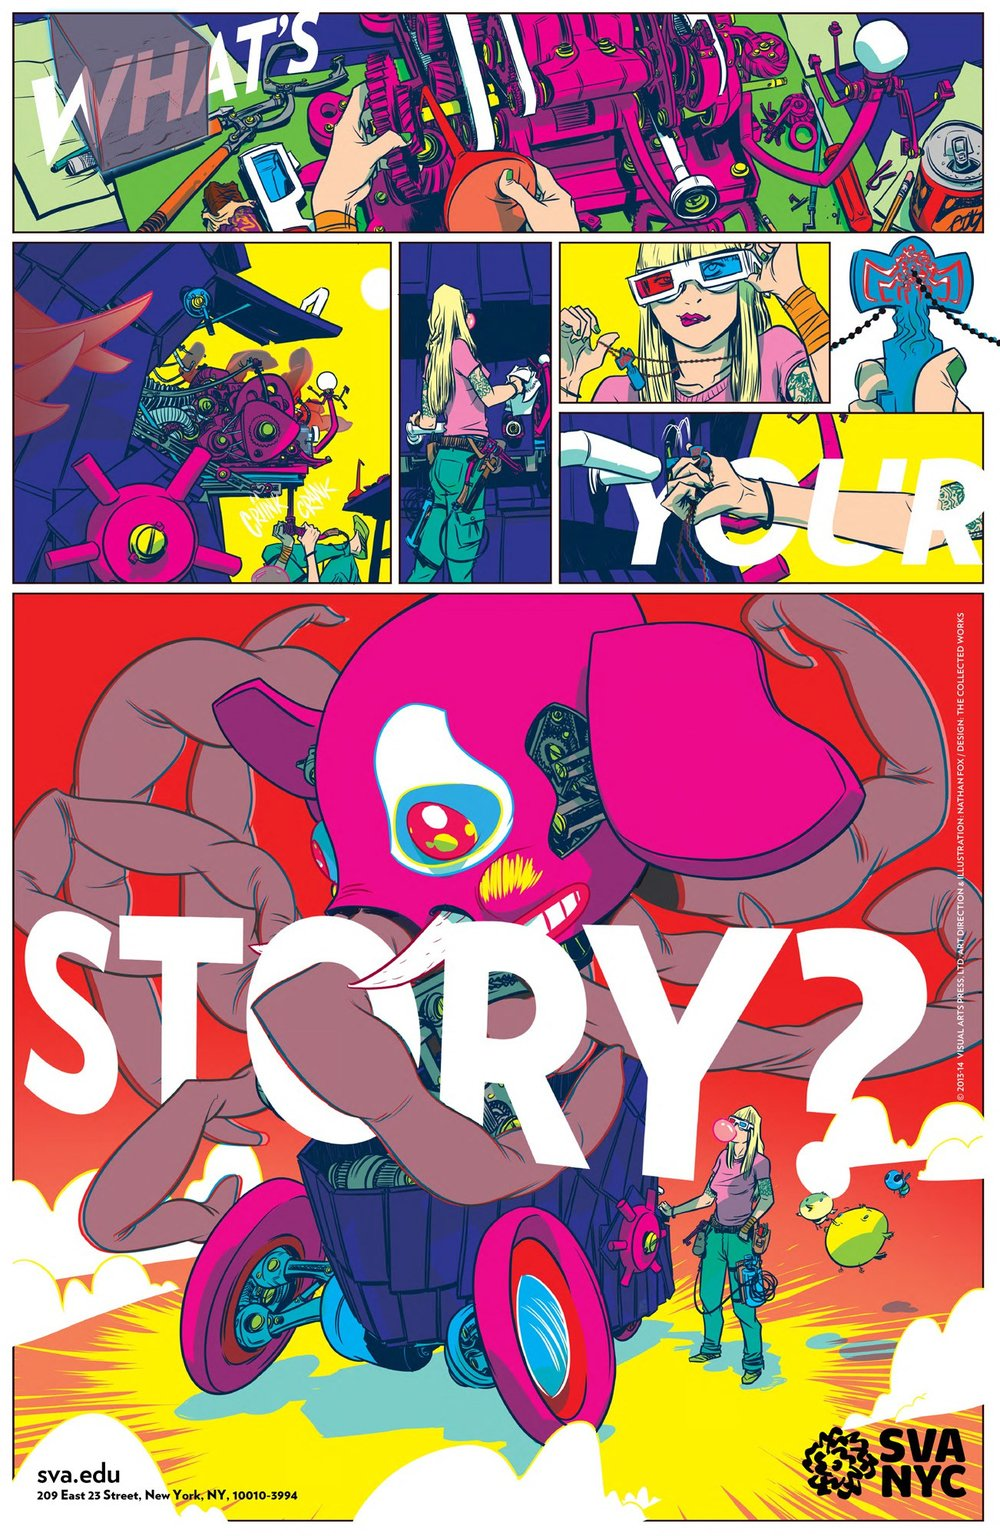 Nathan Fox / Subway poster for SVA